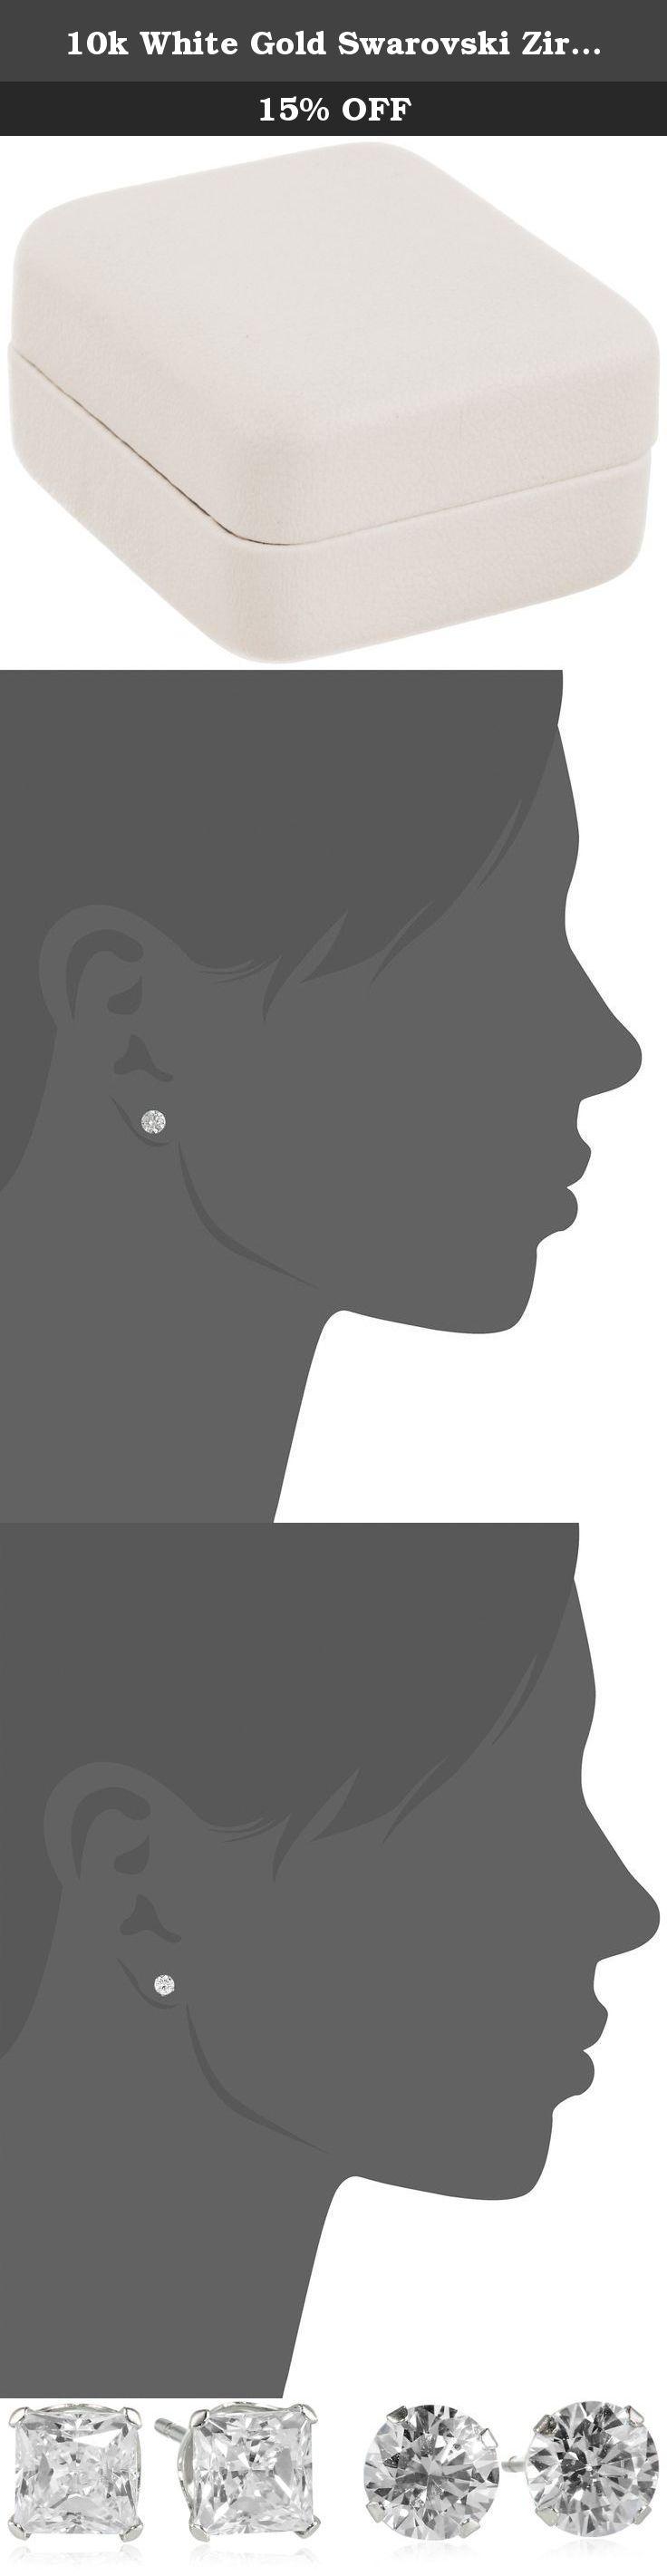 10k White Gold Swarovski Zirconia Round Two Stud Earrings Set (1 1/2 cttw). Length of 5mm RD earring: 0.197, 4.5mm Princess earring:0.177 inches. Domestic. 14k gold-filled earring backs.